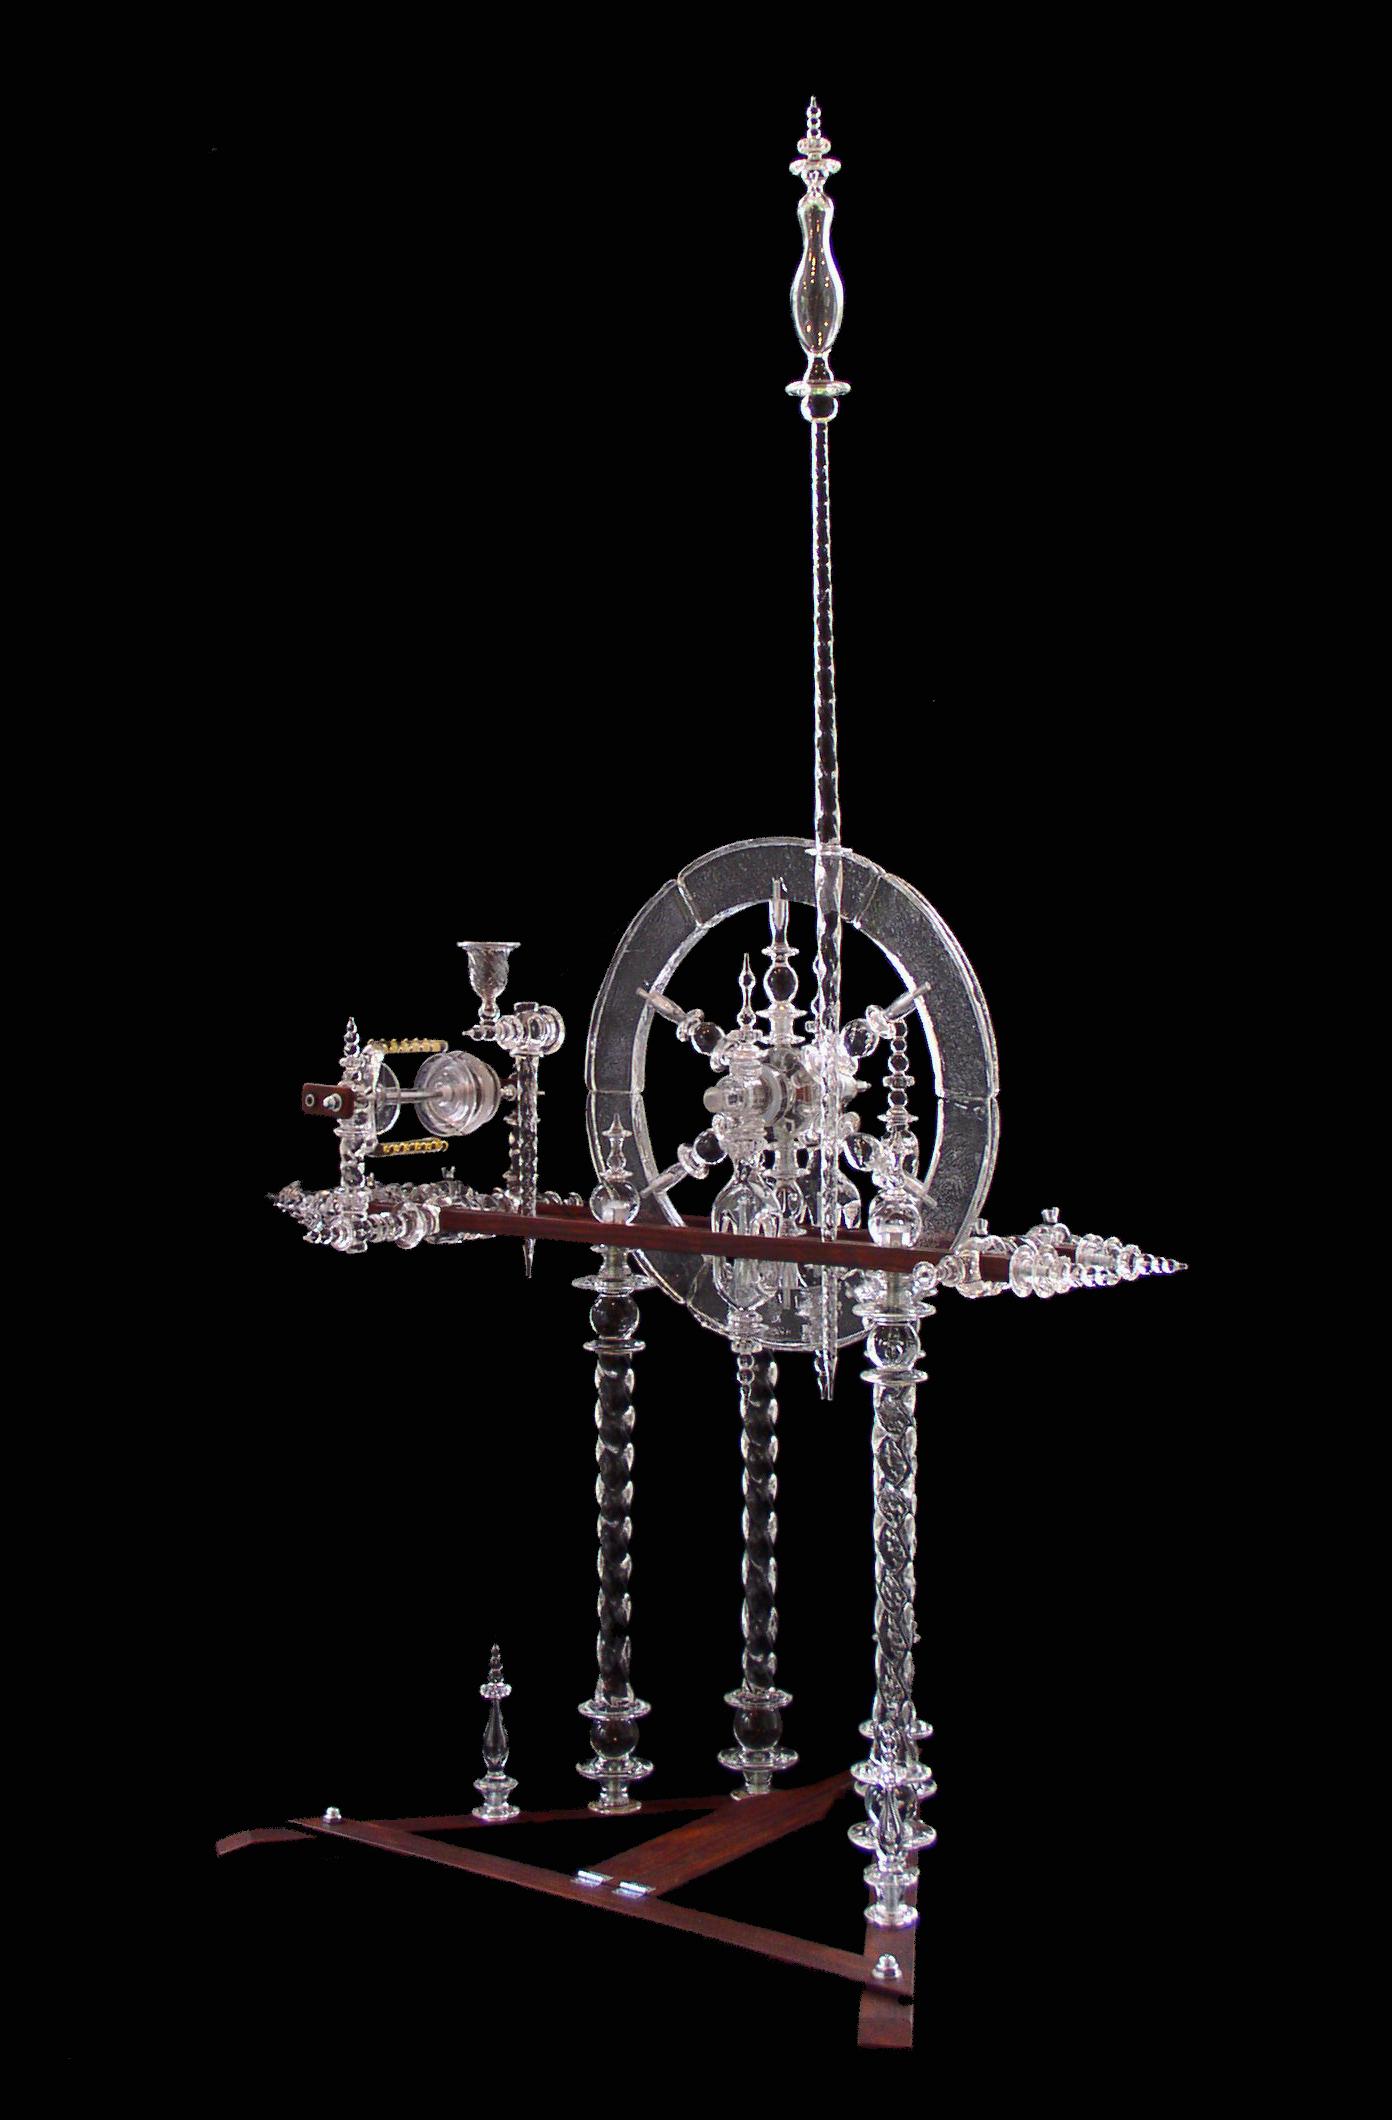 andy-paiko-spinning-wheel2.jpg